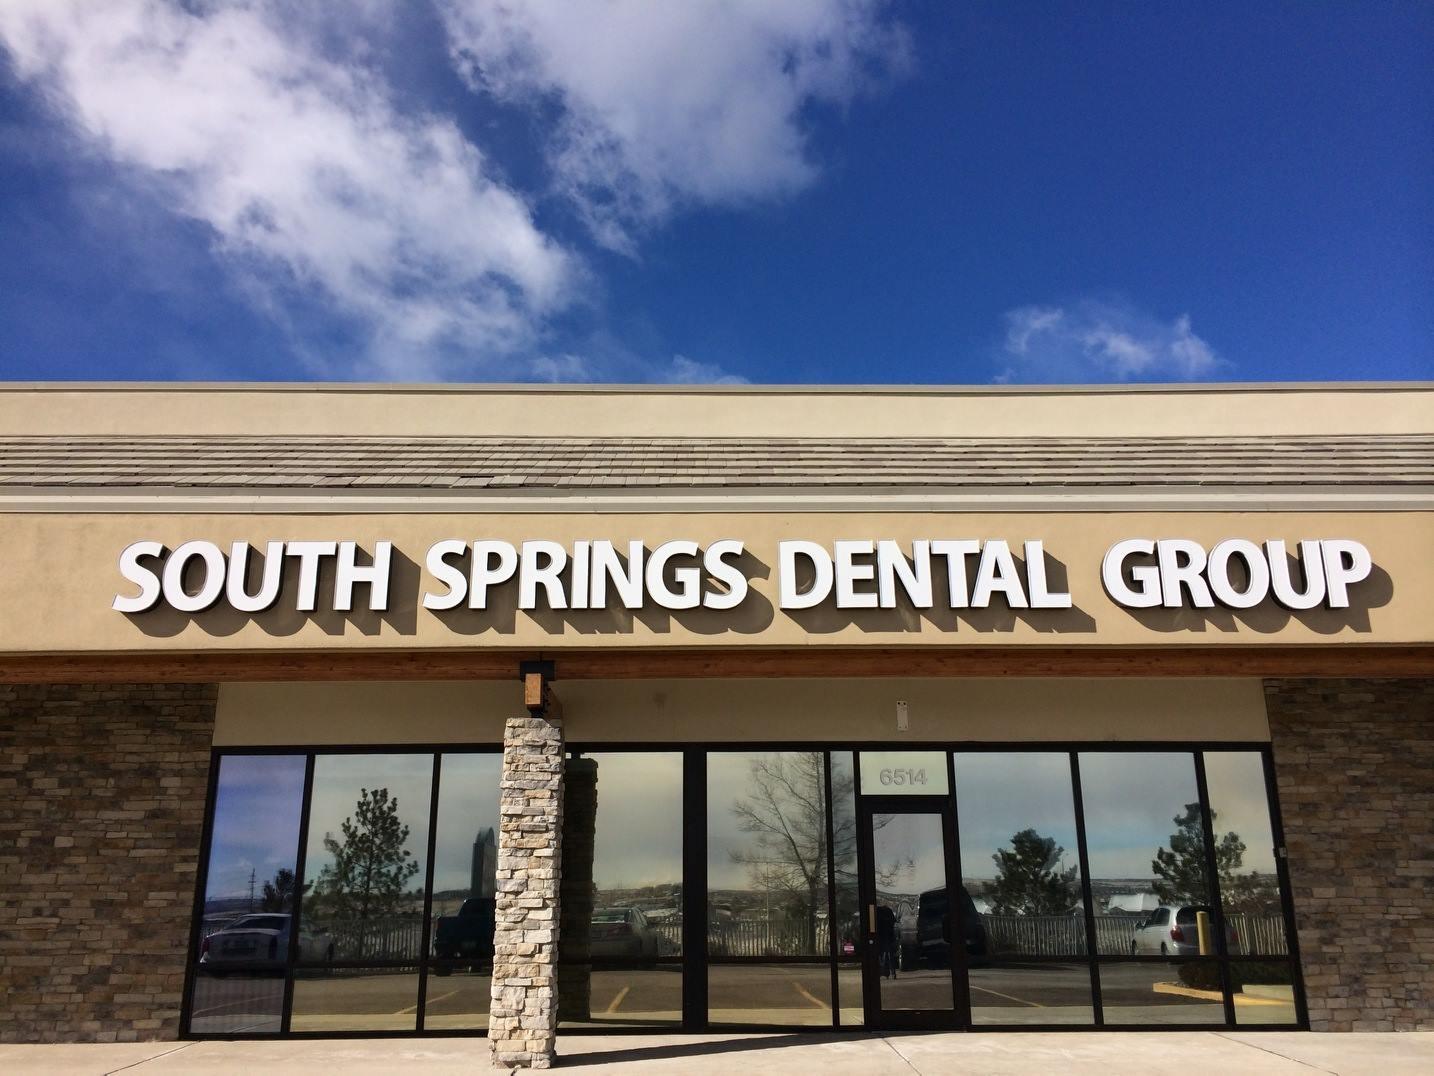 Outside of South Springs Dental Office